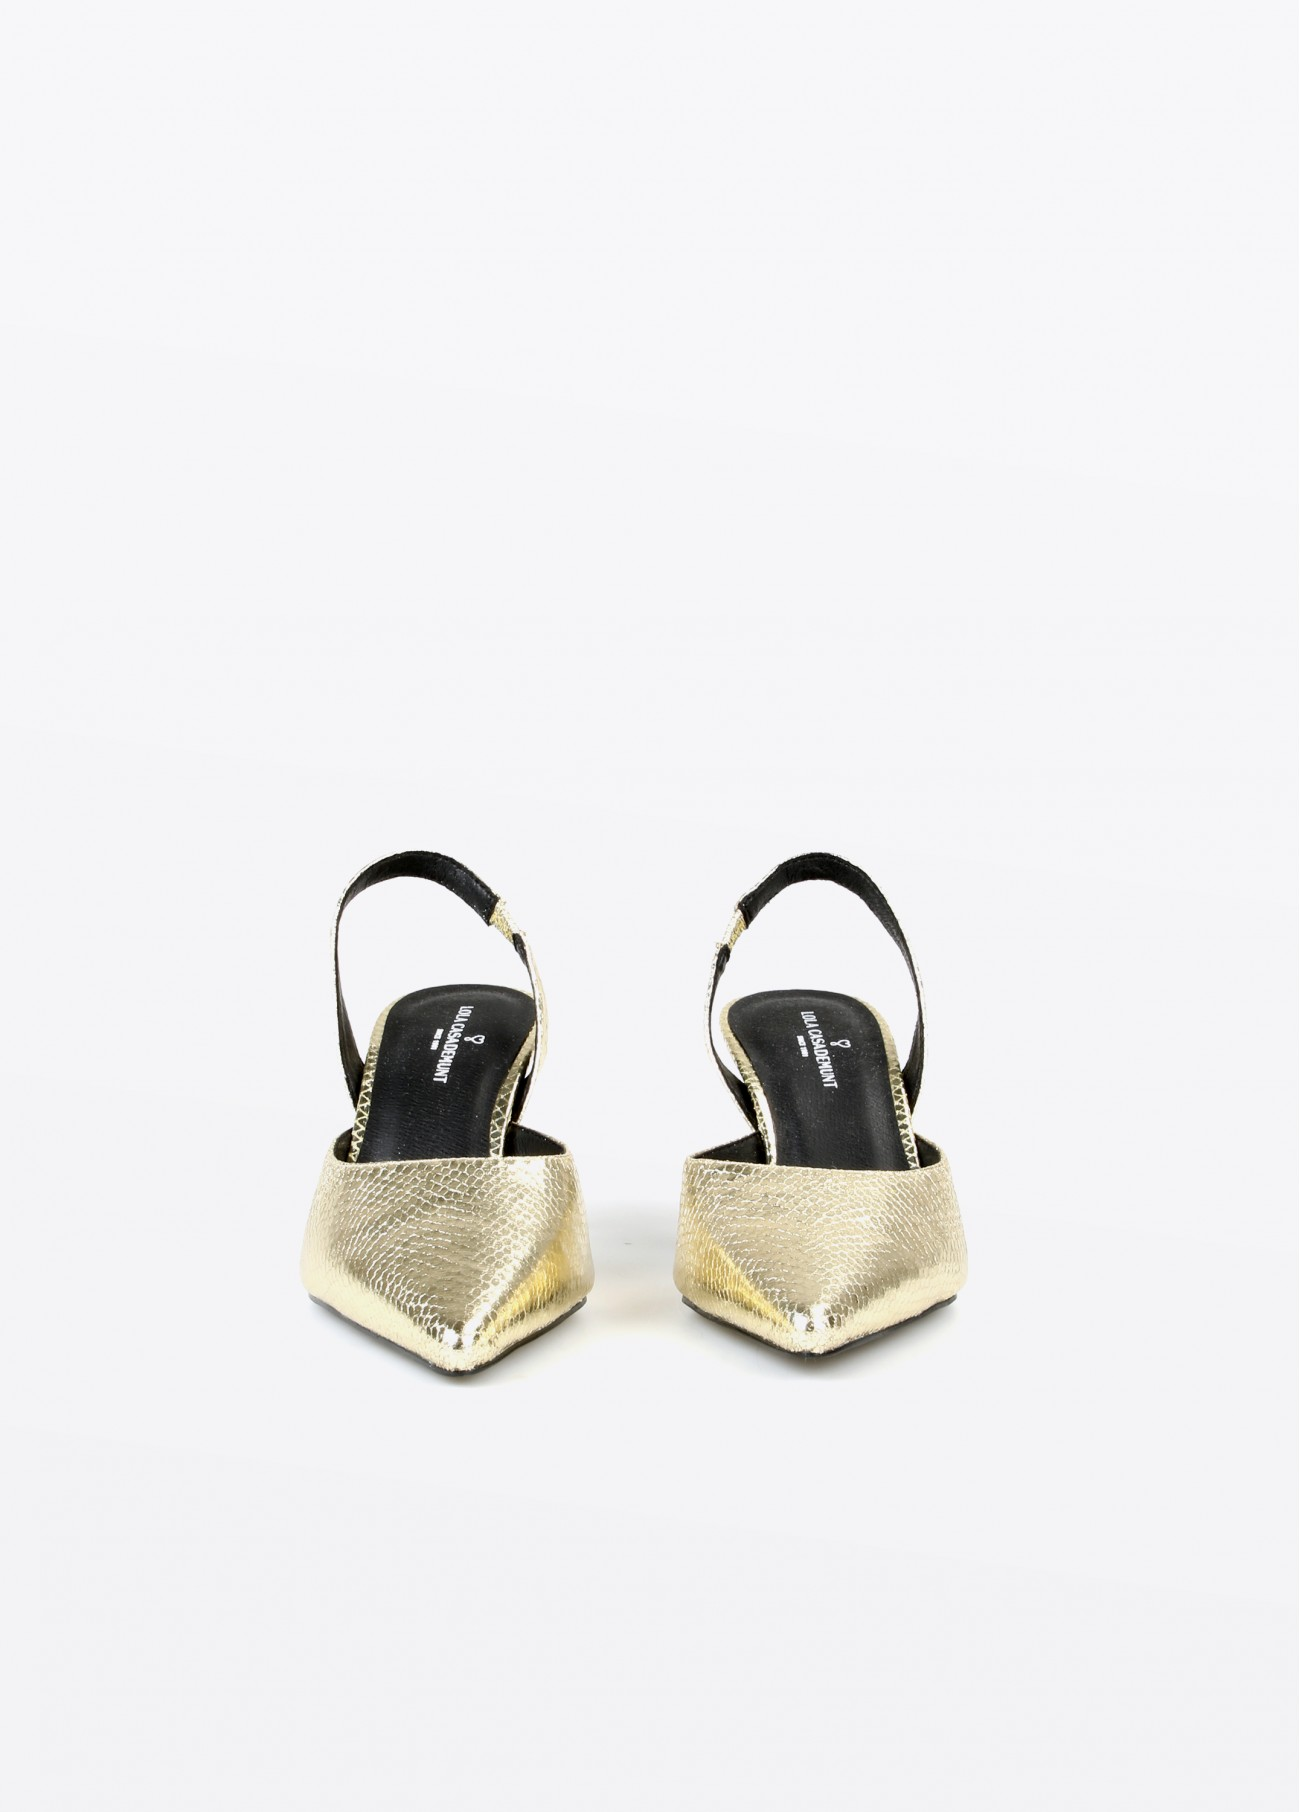 Sandalia tacón serpiente dorada, dorado 2